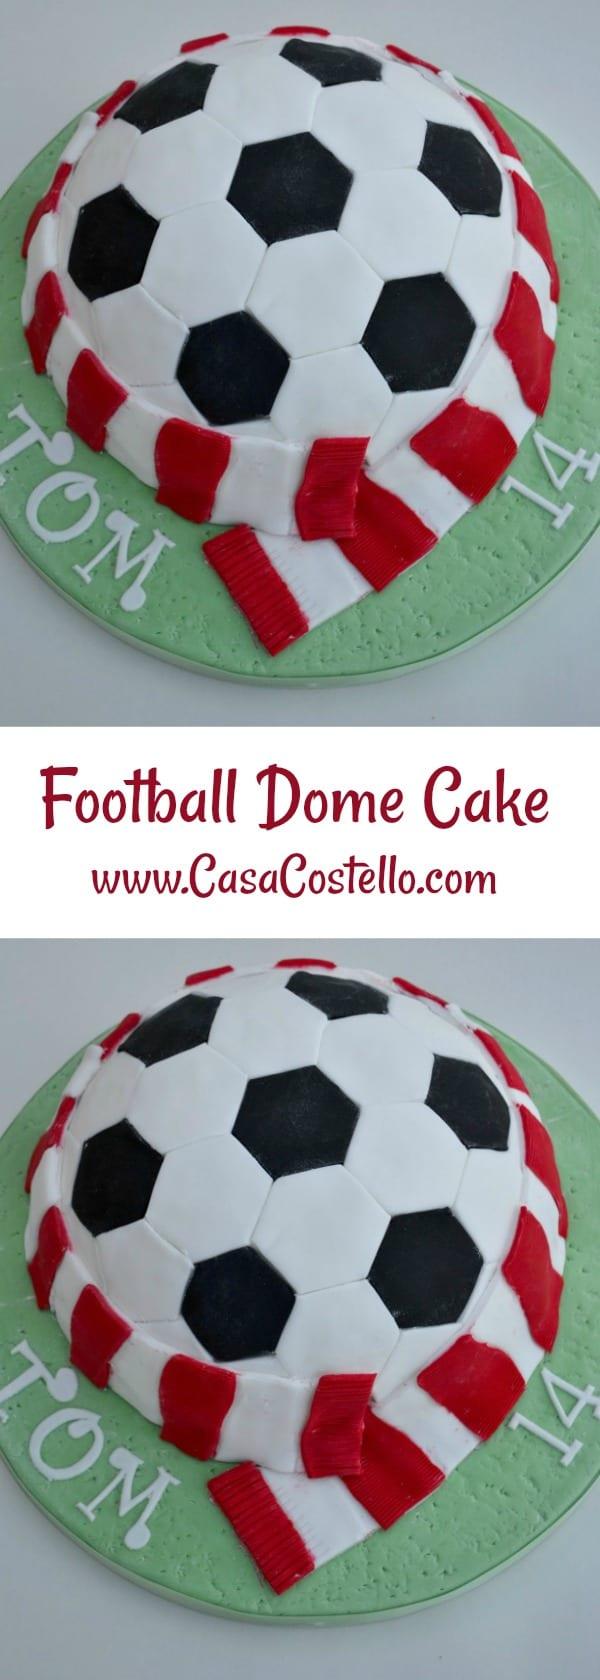 Football Dome Cake Novelty Birthday Cake for a teenage football lover